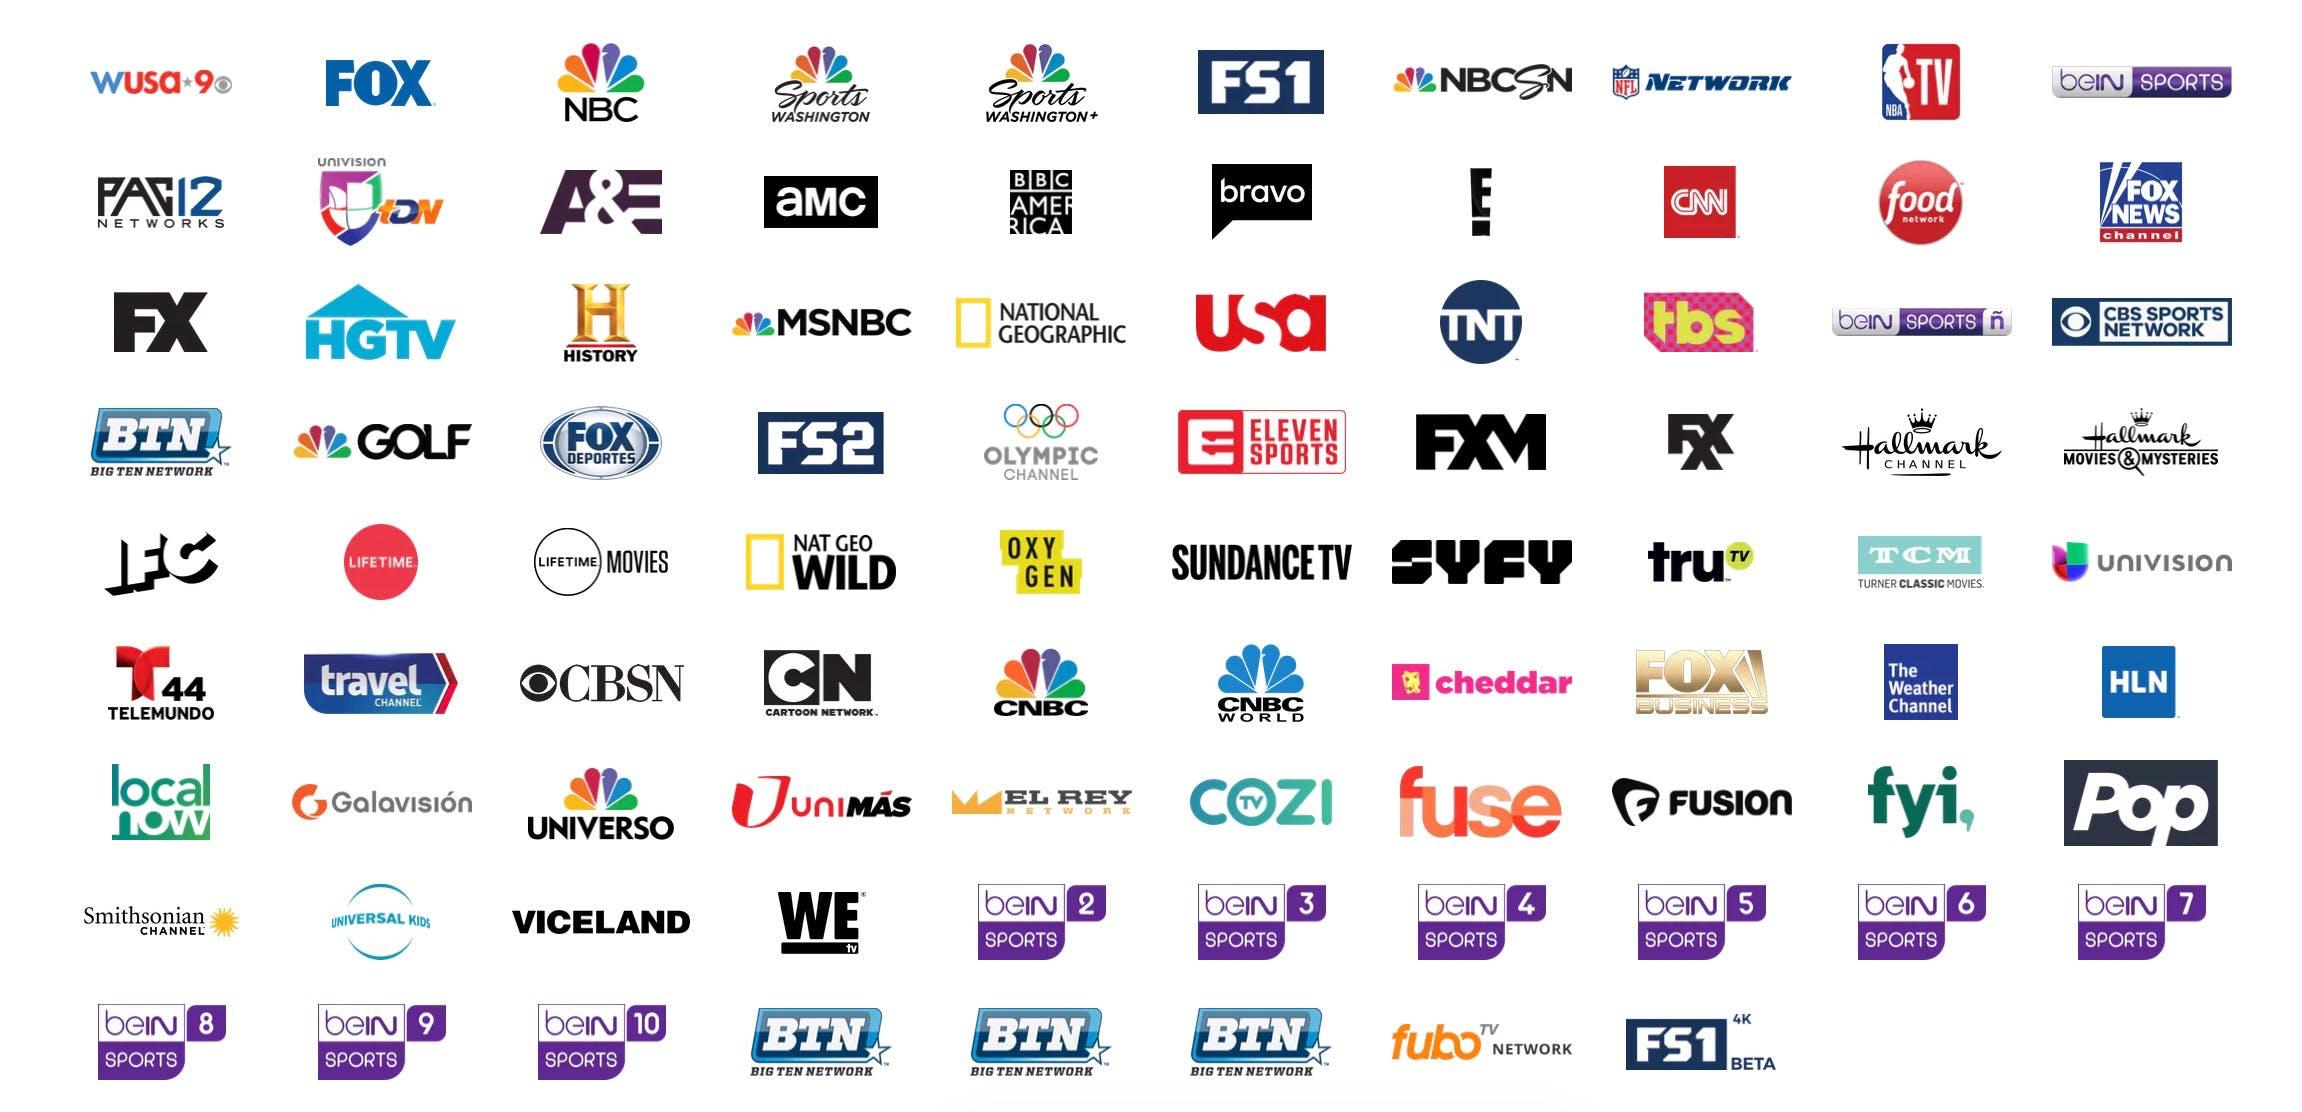 nbc nhl live stream fubotv channels